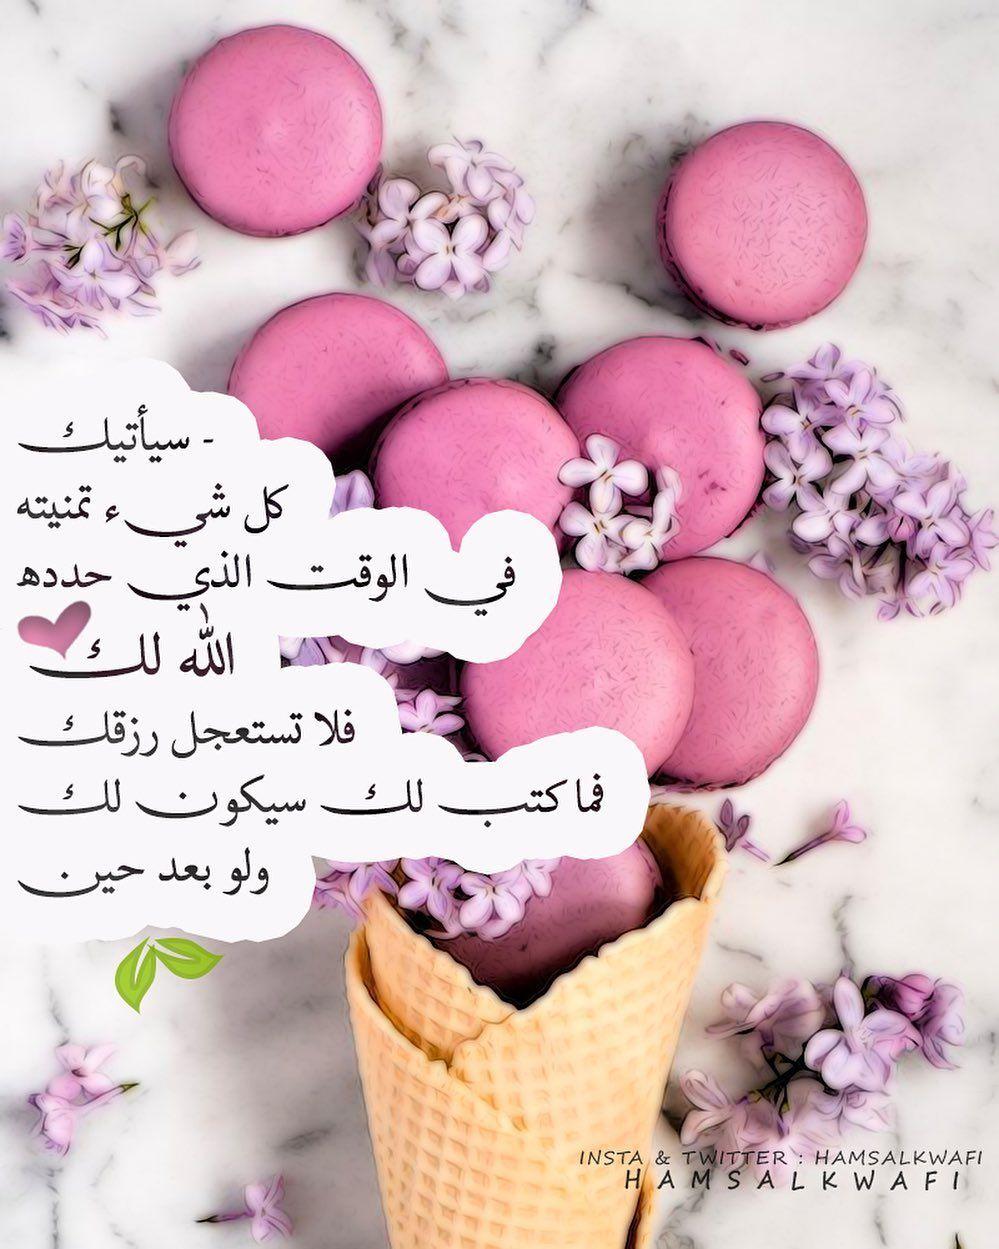 4 299 Likes 104 Comments كہ ن ذا أثہ ـر Hamsalkwafi On Instagram اللهم أجعلنا ممن تفائل بخيرك ف أ Islam Beliefs Nose Drawing Flower Wallpaper